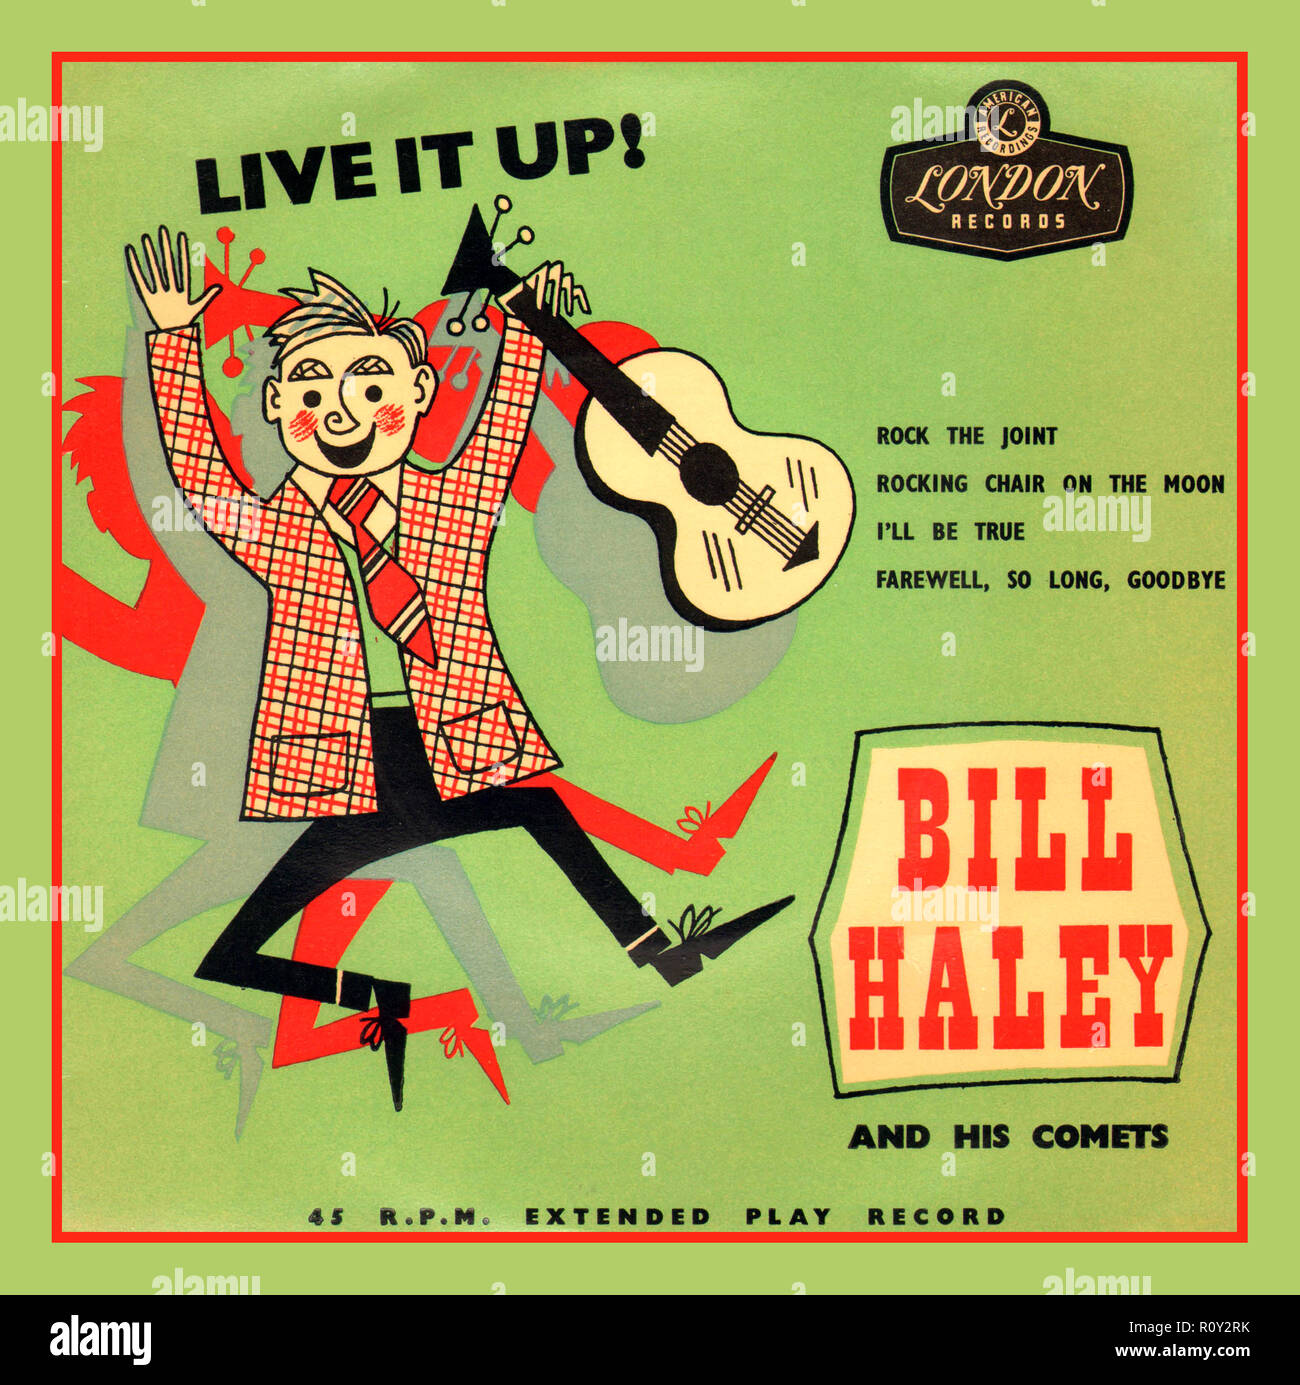 Live Album Stock Photos & Live Album Stock Images - Alamy